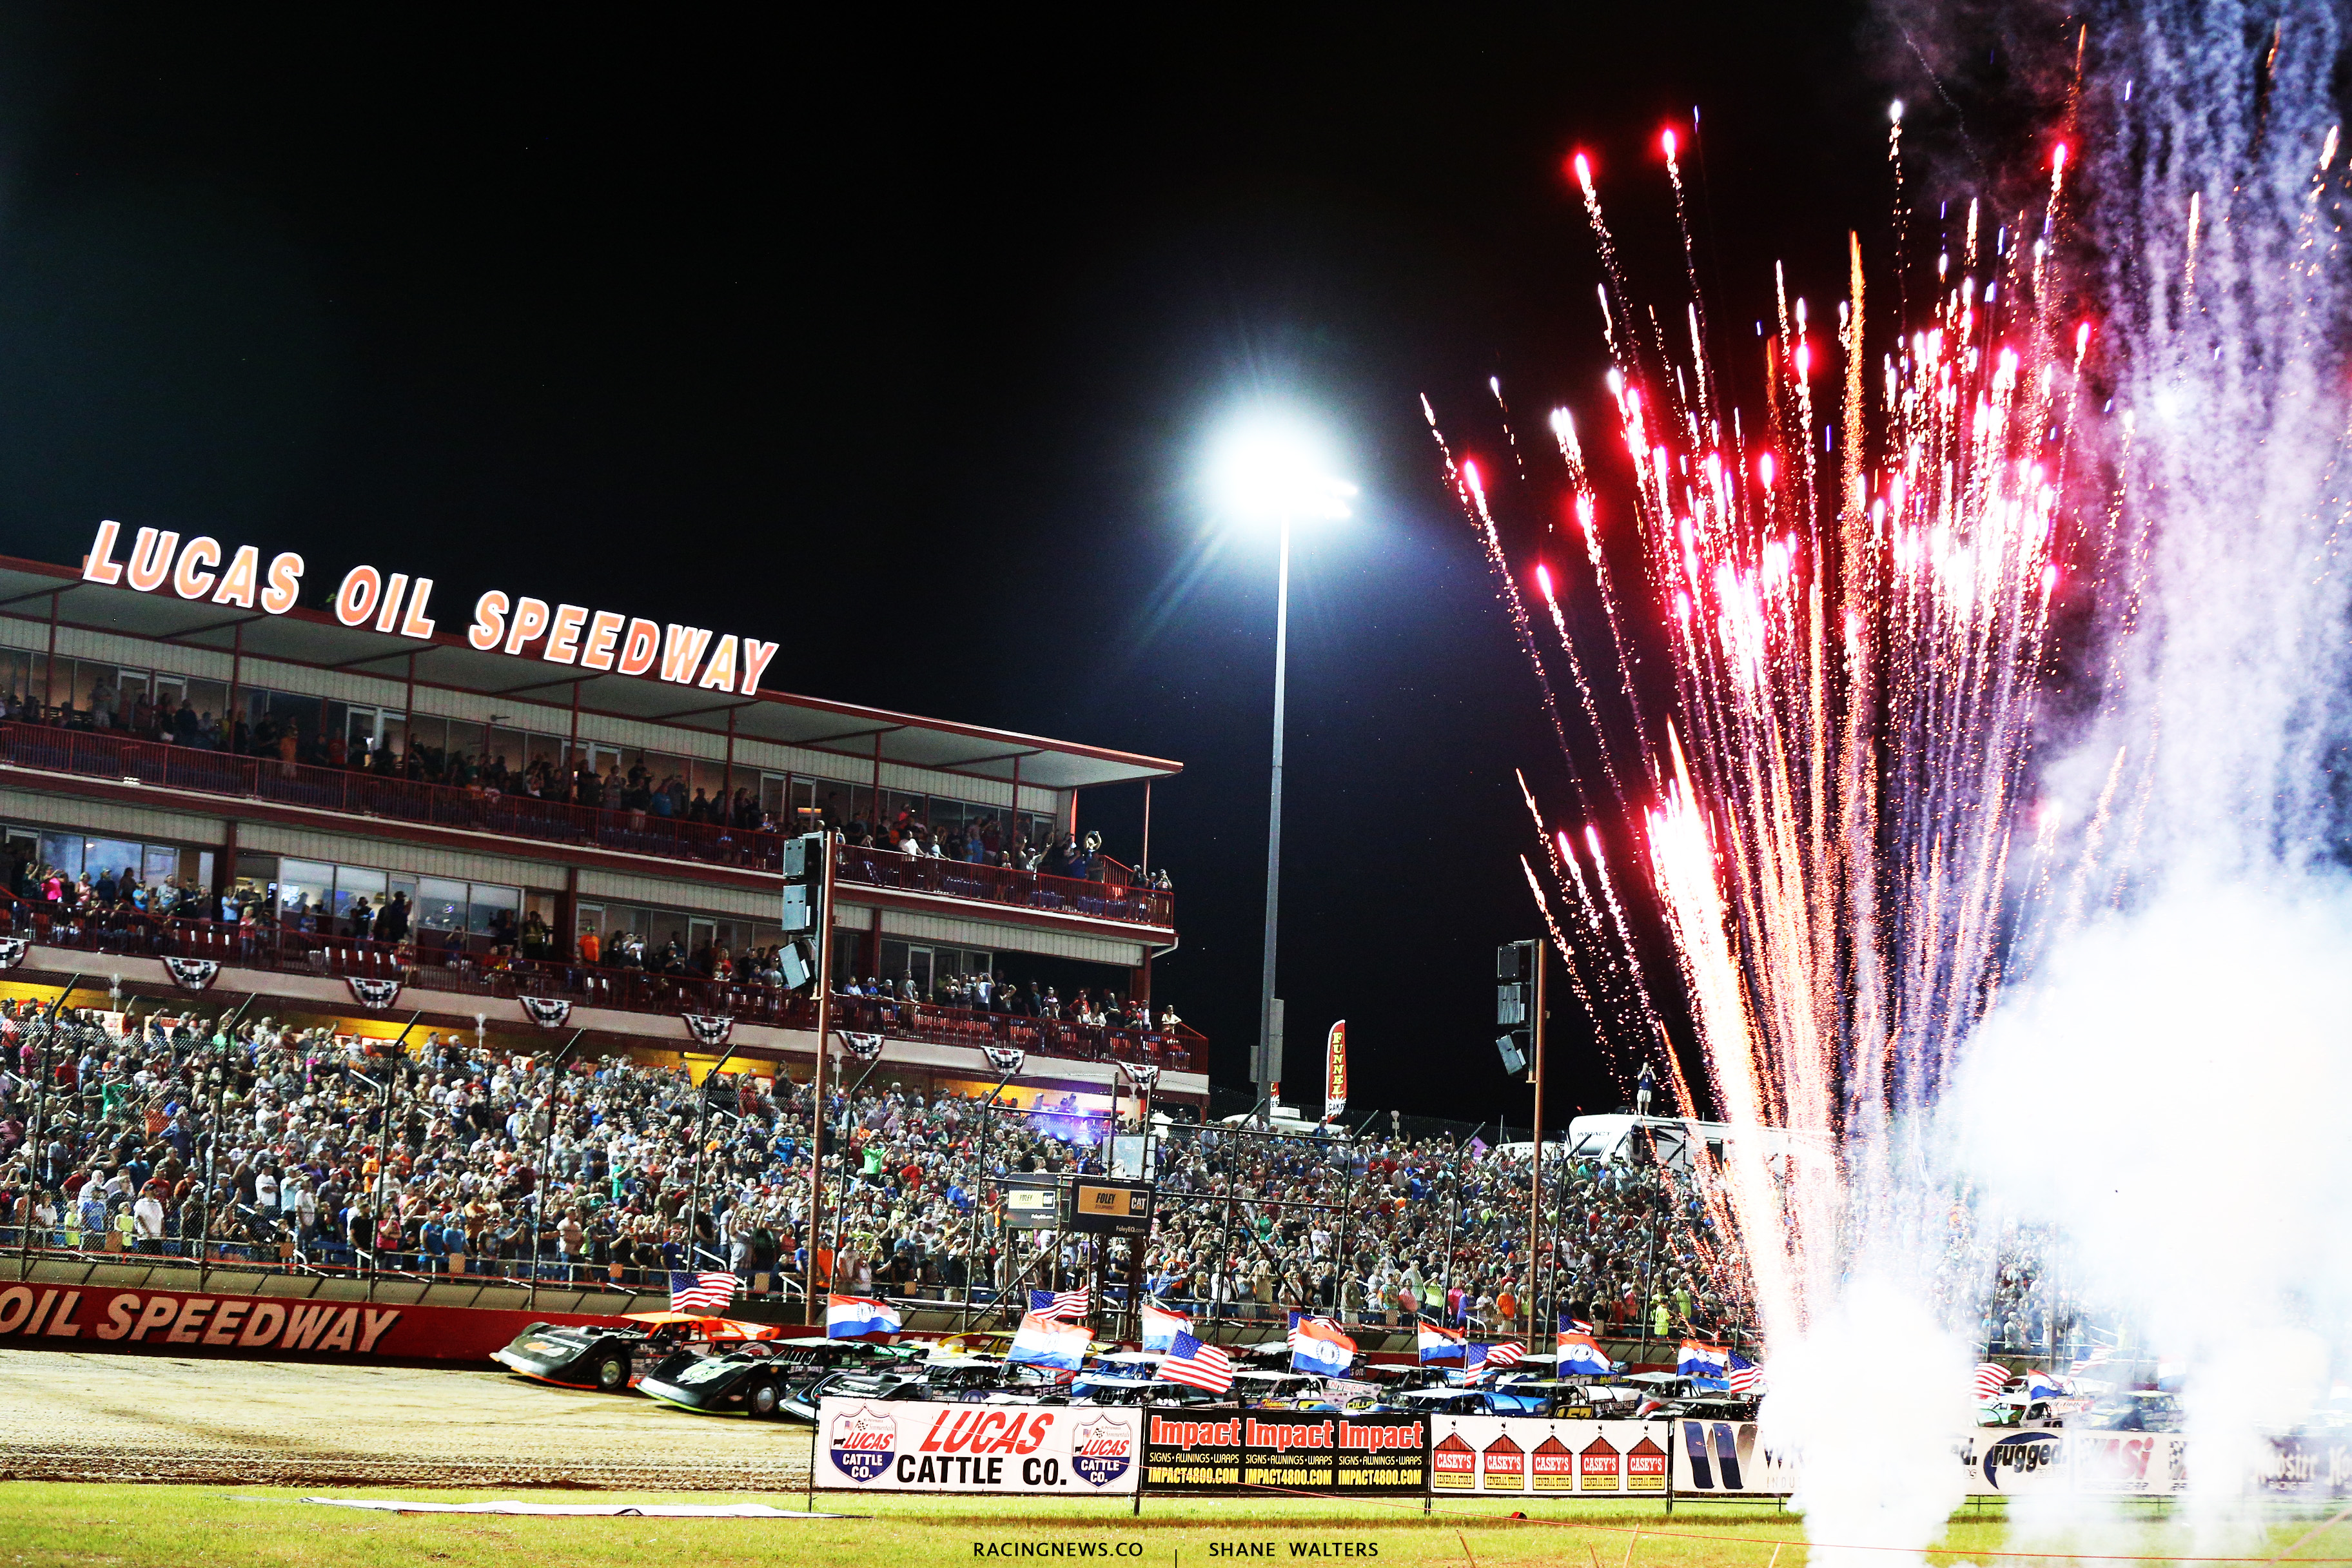 Fireworks at Lucas Oil Speedway 8947